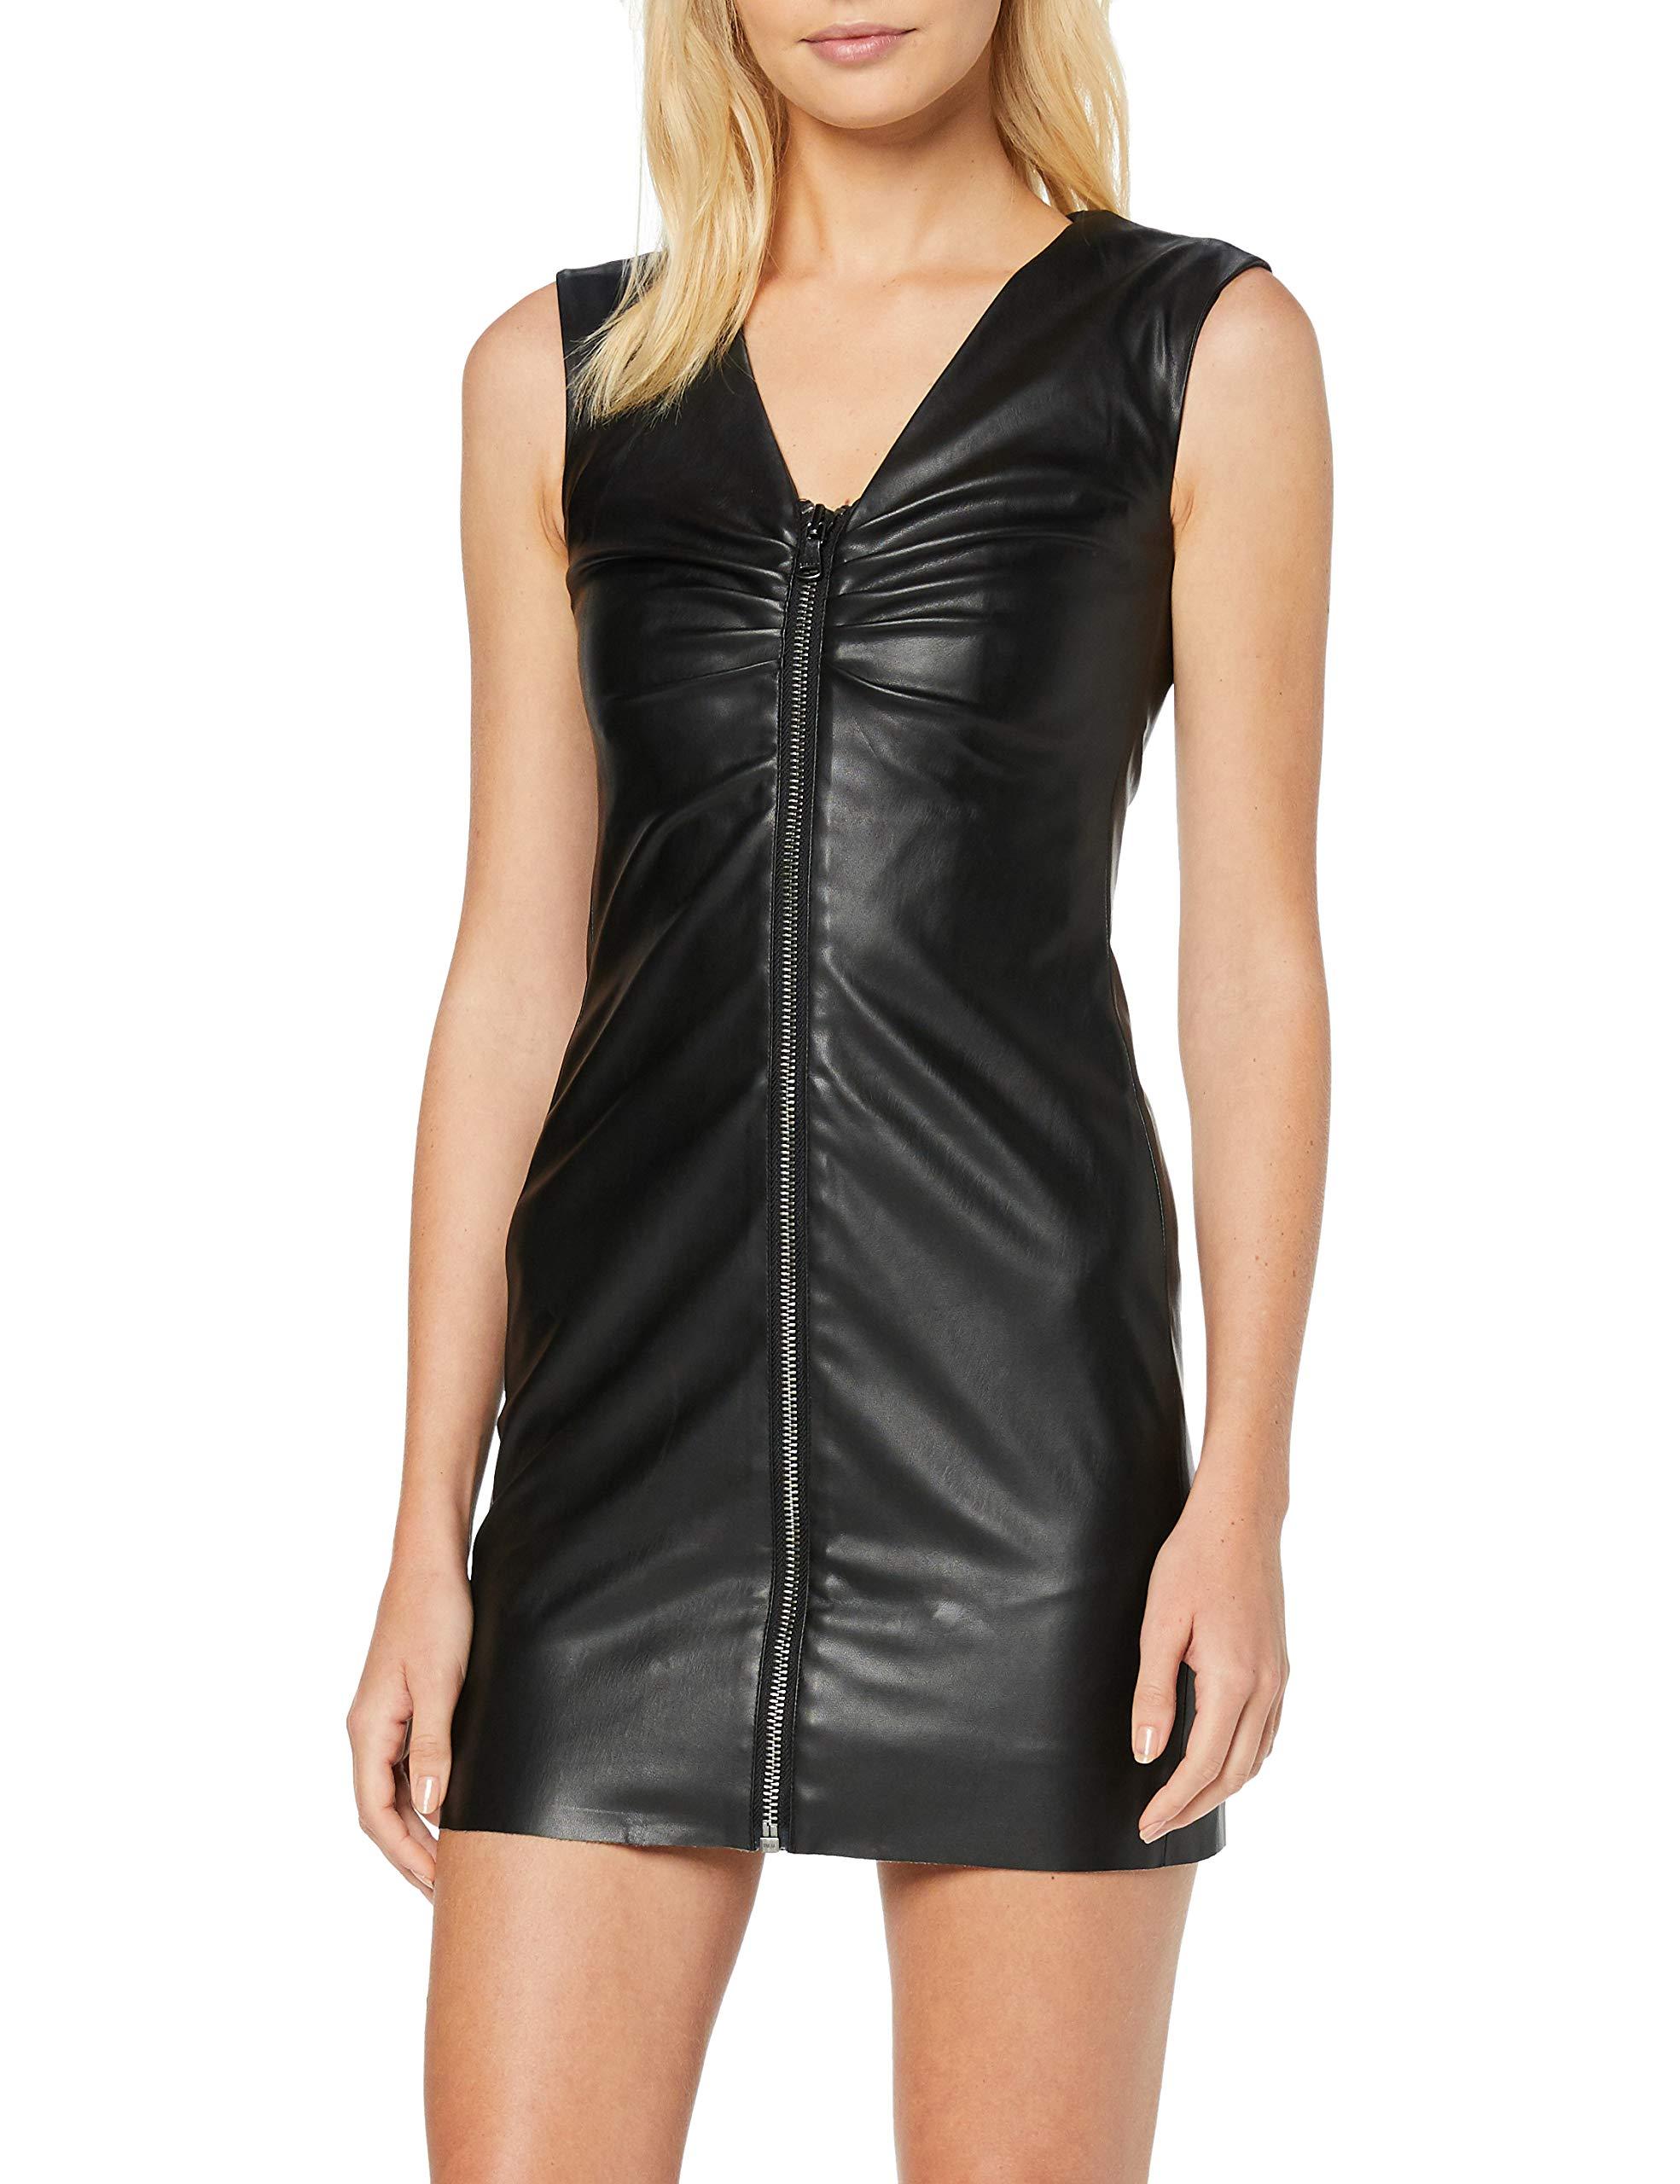 RobeNoirnero Fabricant42Femme 10044taille Sisley RobeNoirnero Sisley Dress Dress w0NvnOm8